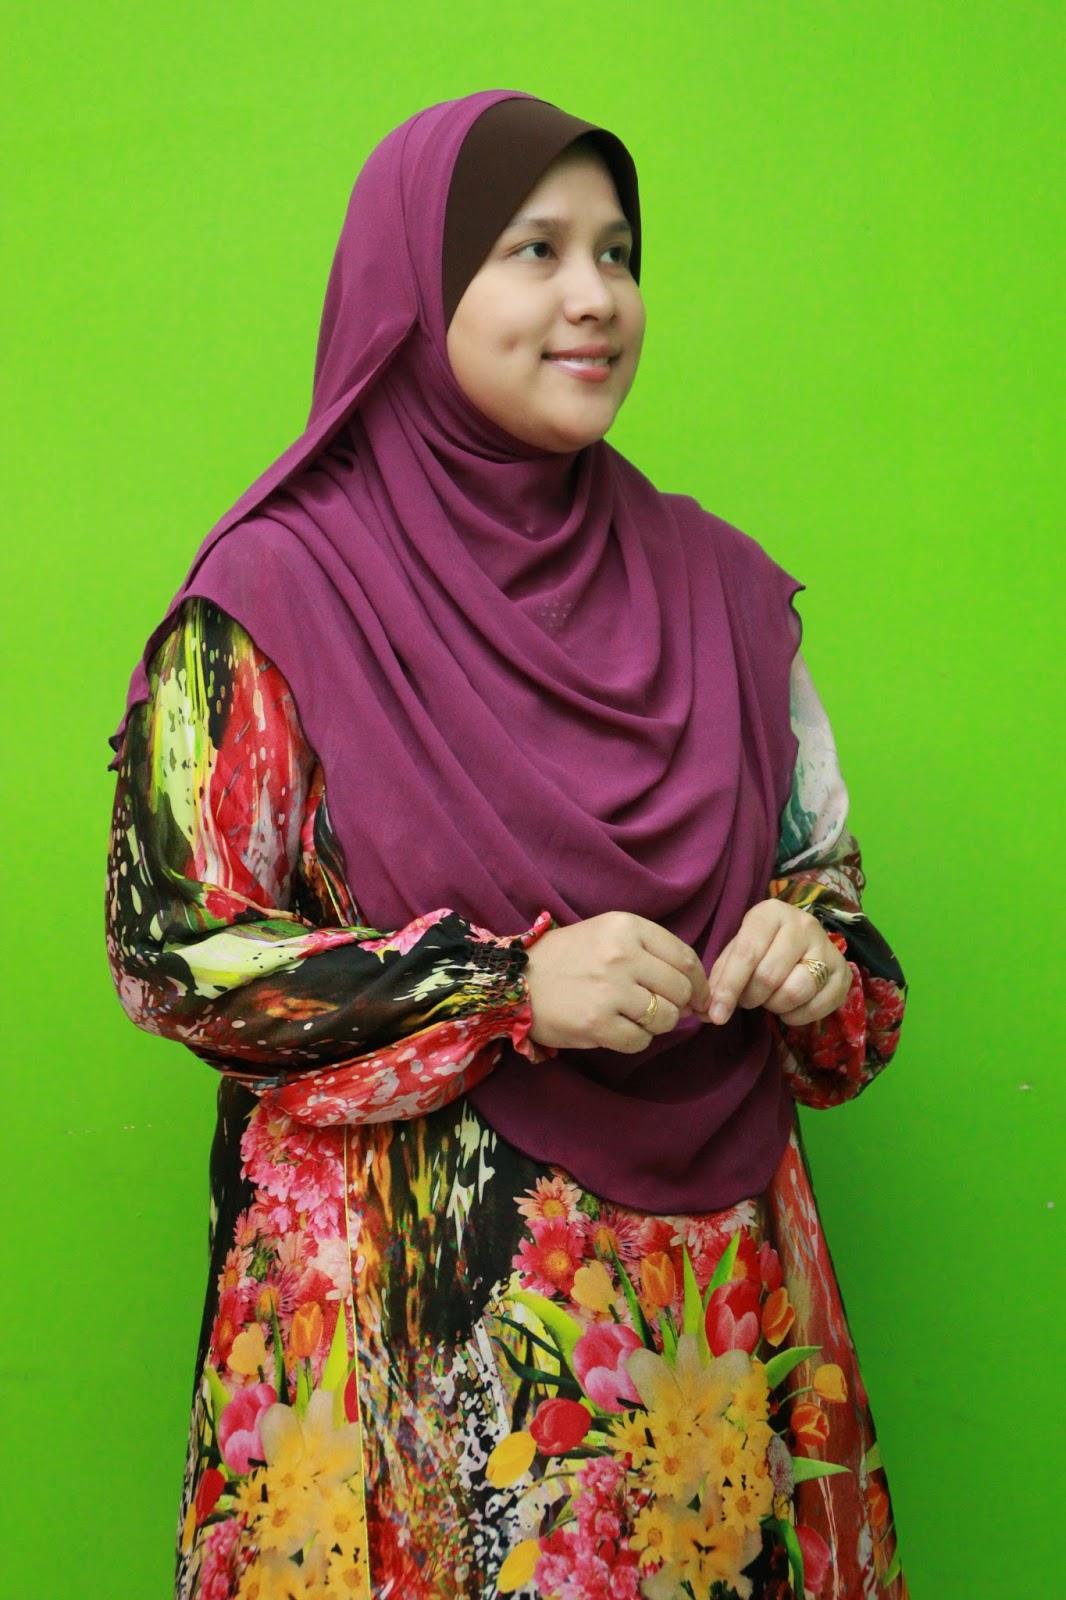 http://www.annajahapparel.com.my/p/instant-shawl-safia.html